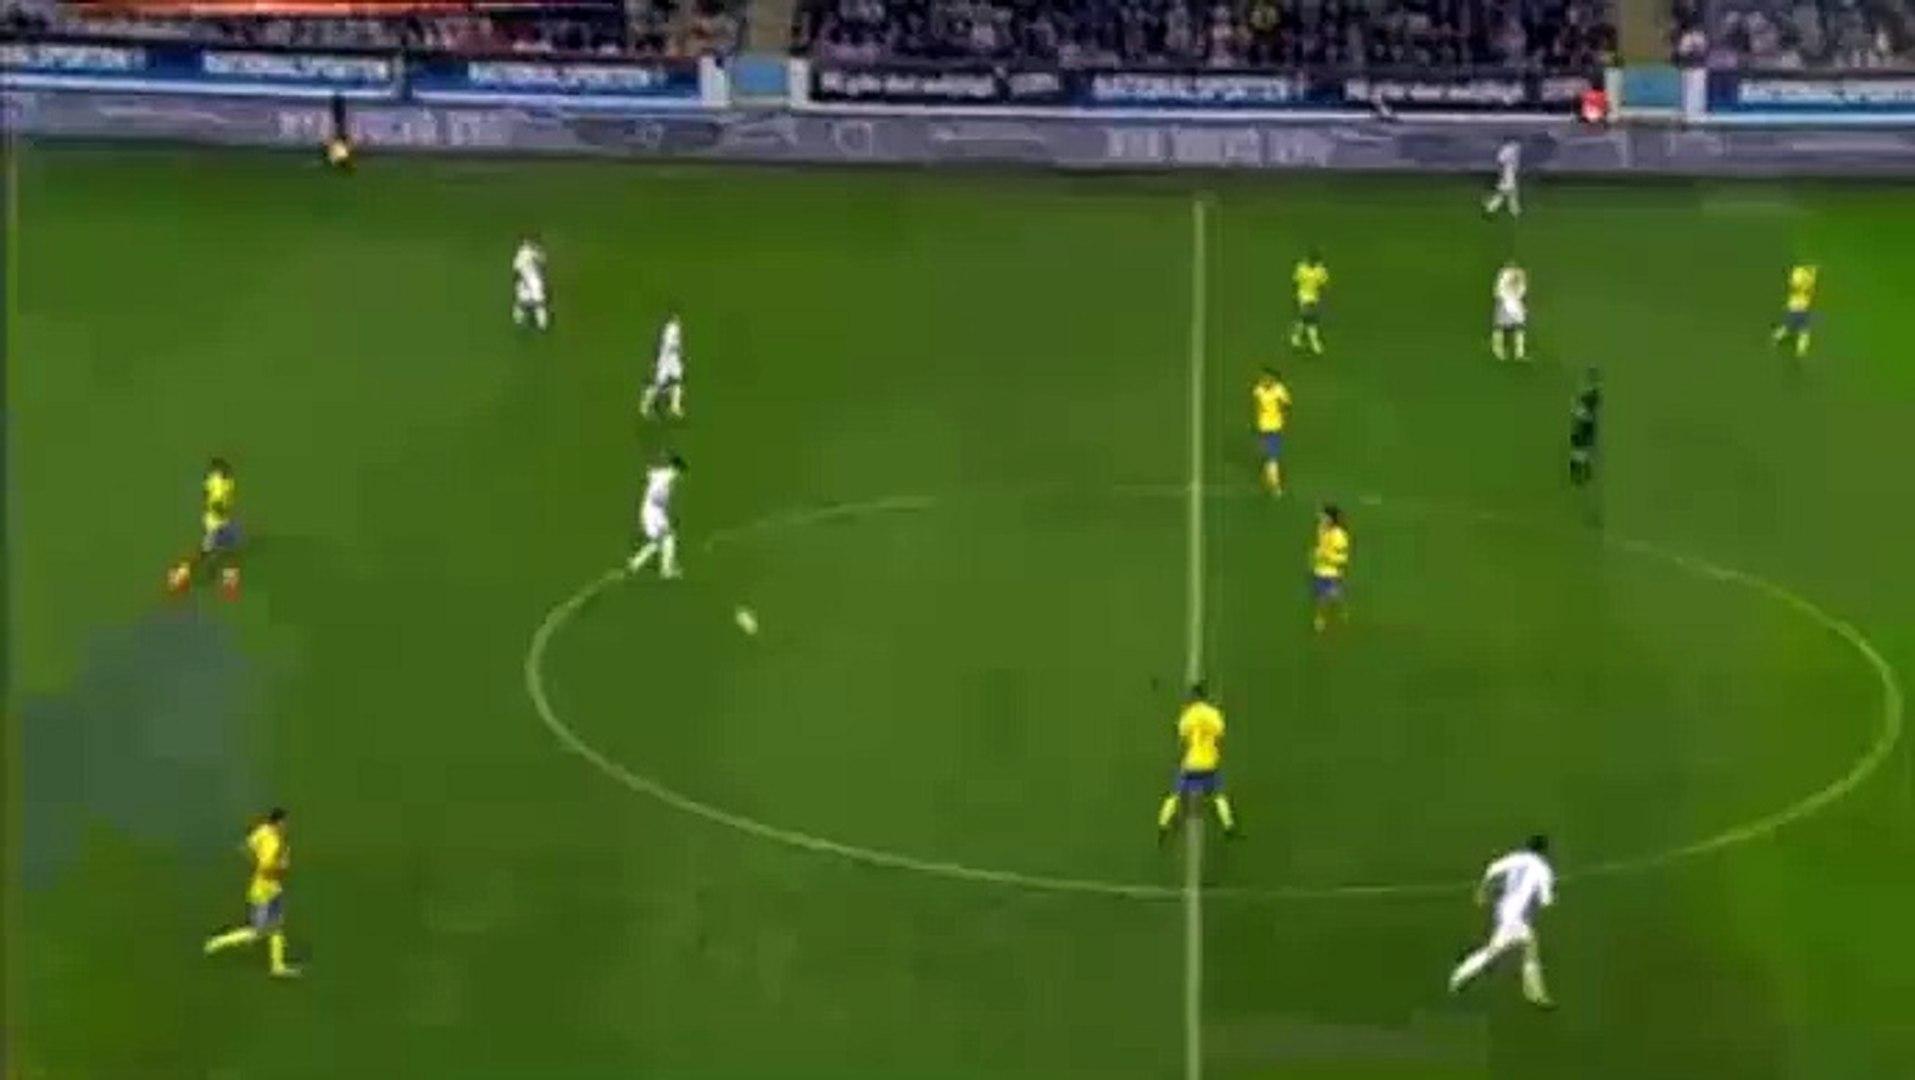 Gerard Deulofeu Amazing Goal - Sweden U21 0-1 Spain U21 - (05/09/2016)